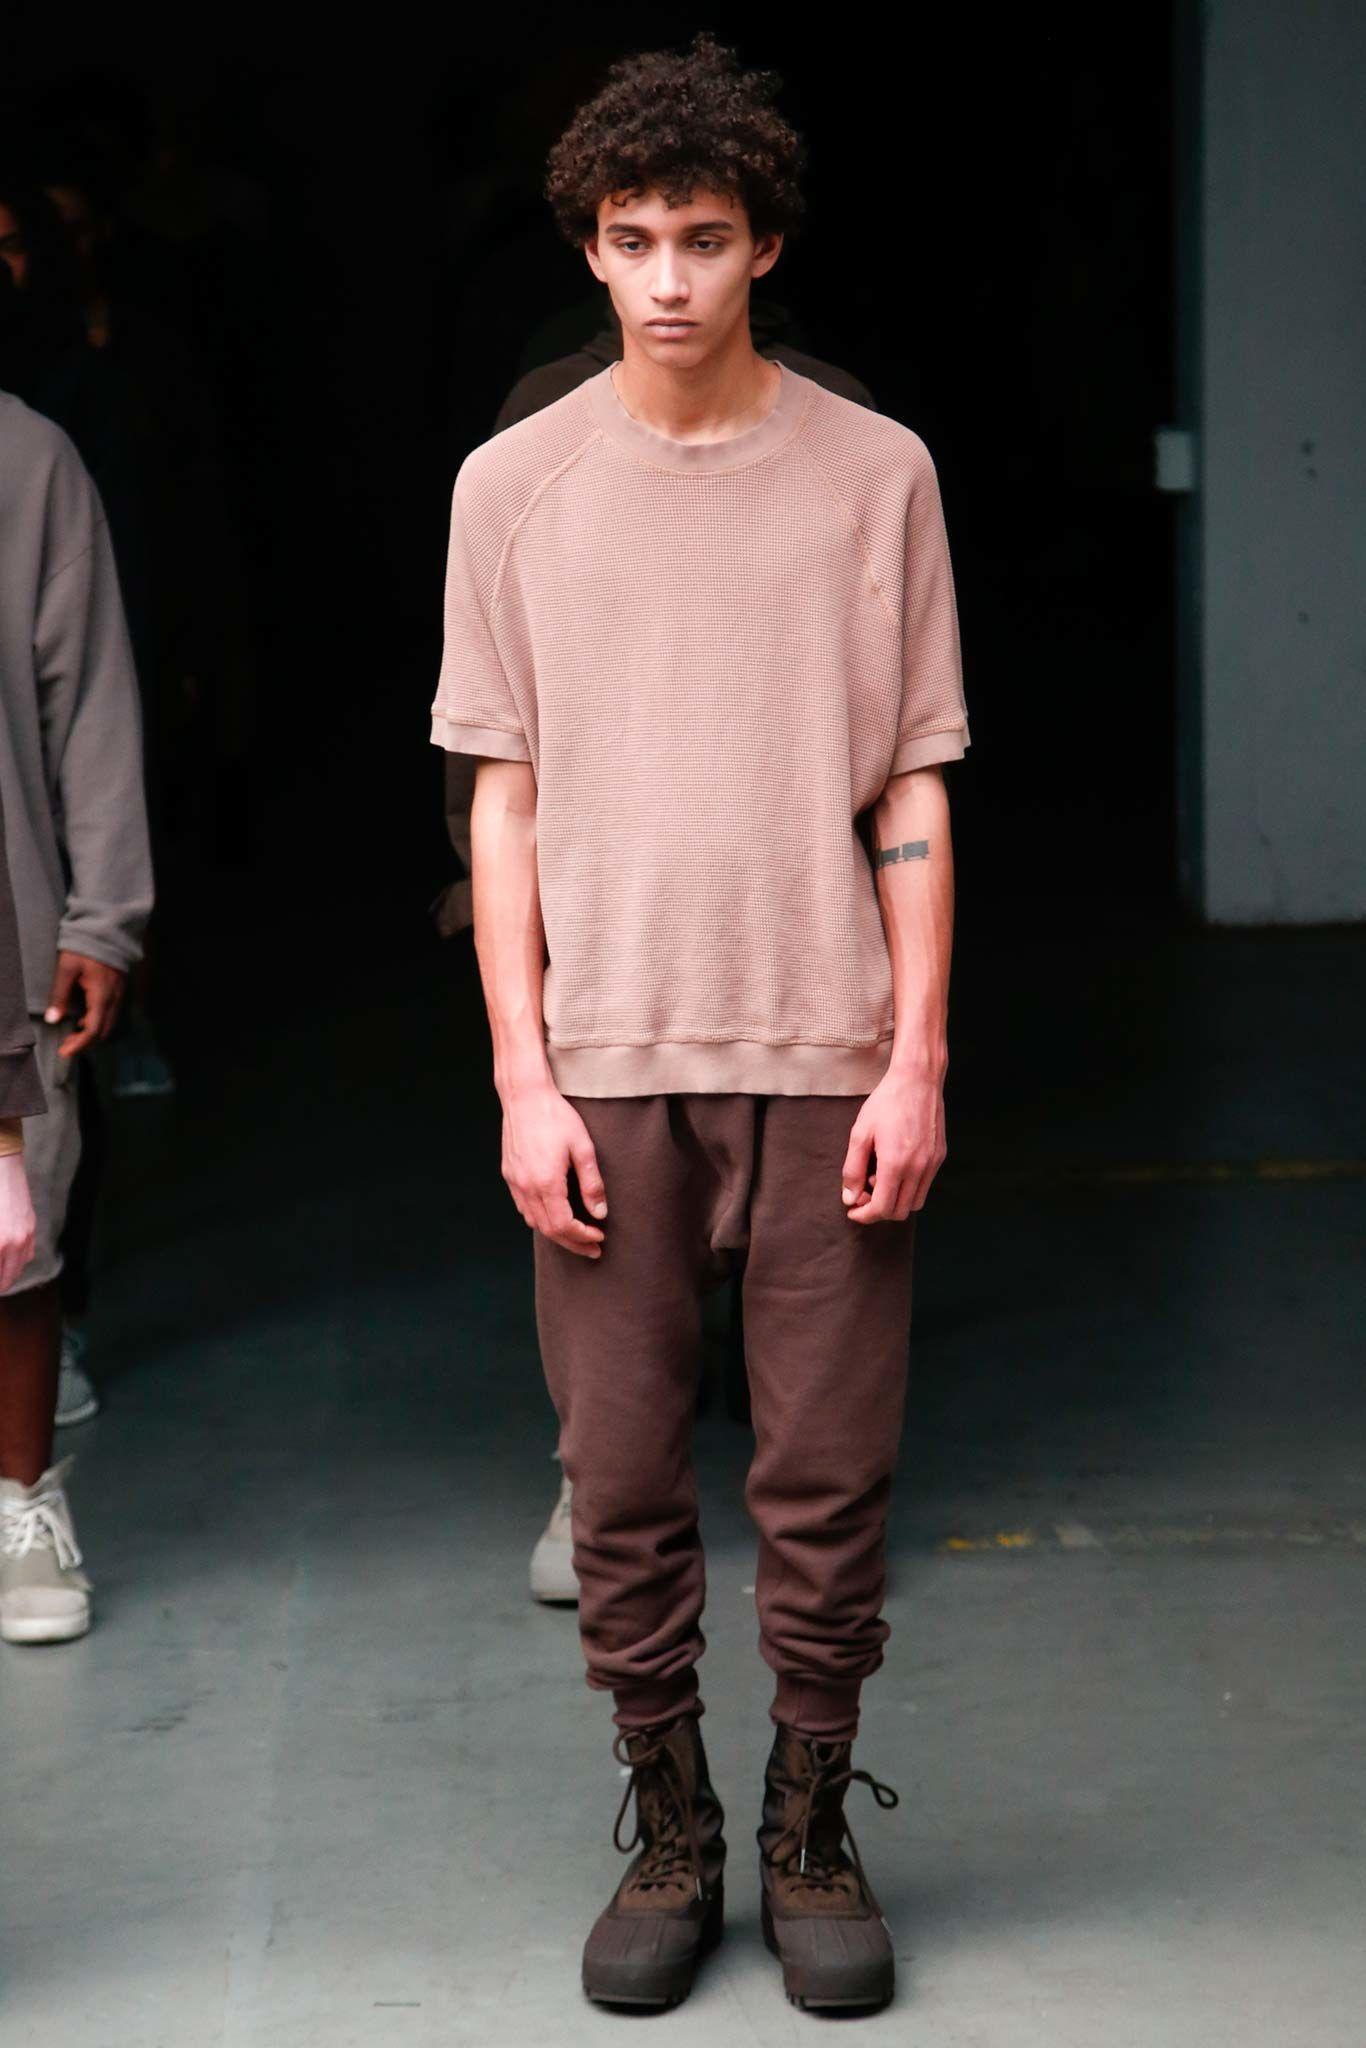 Yeezy fall menswear fashion show the oujays menswear and